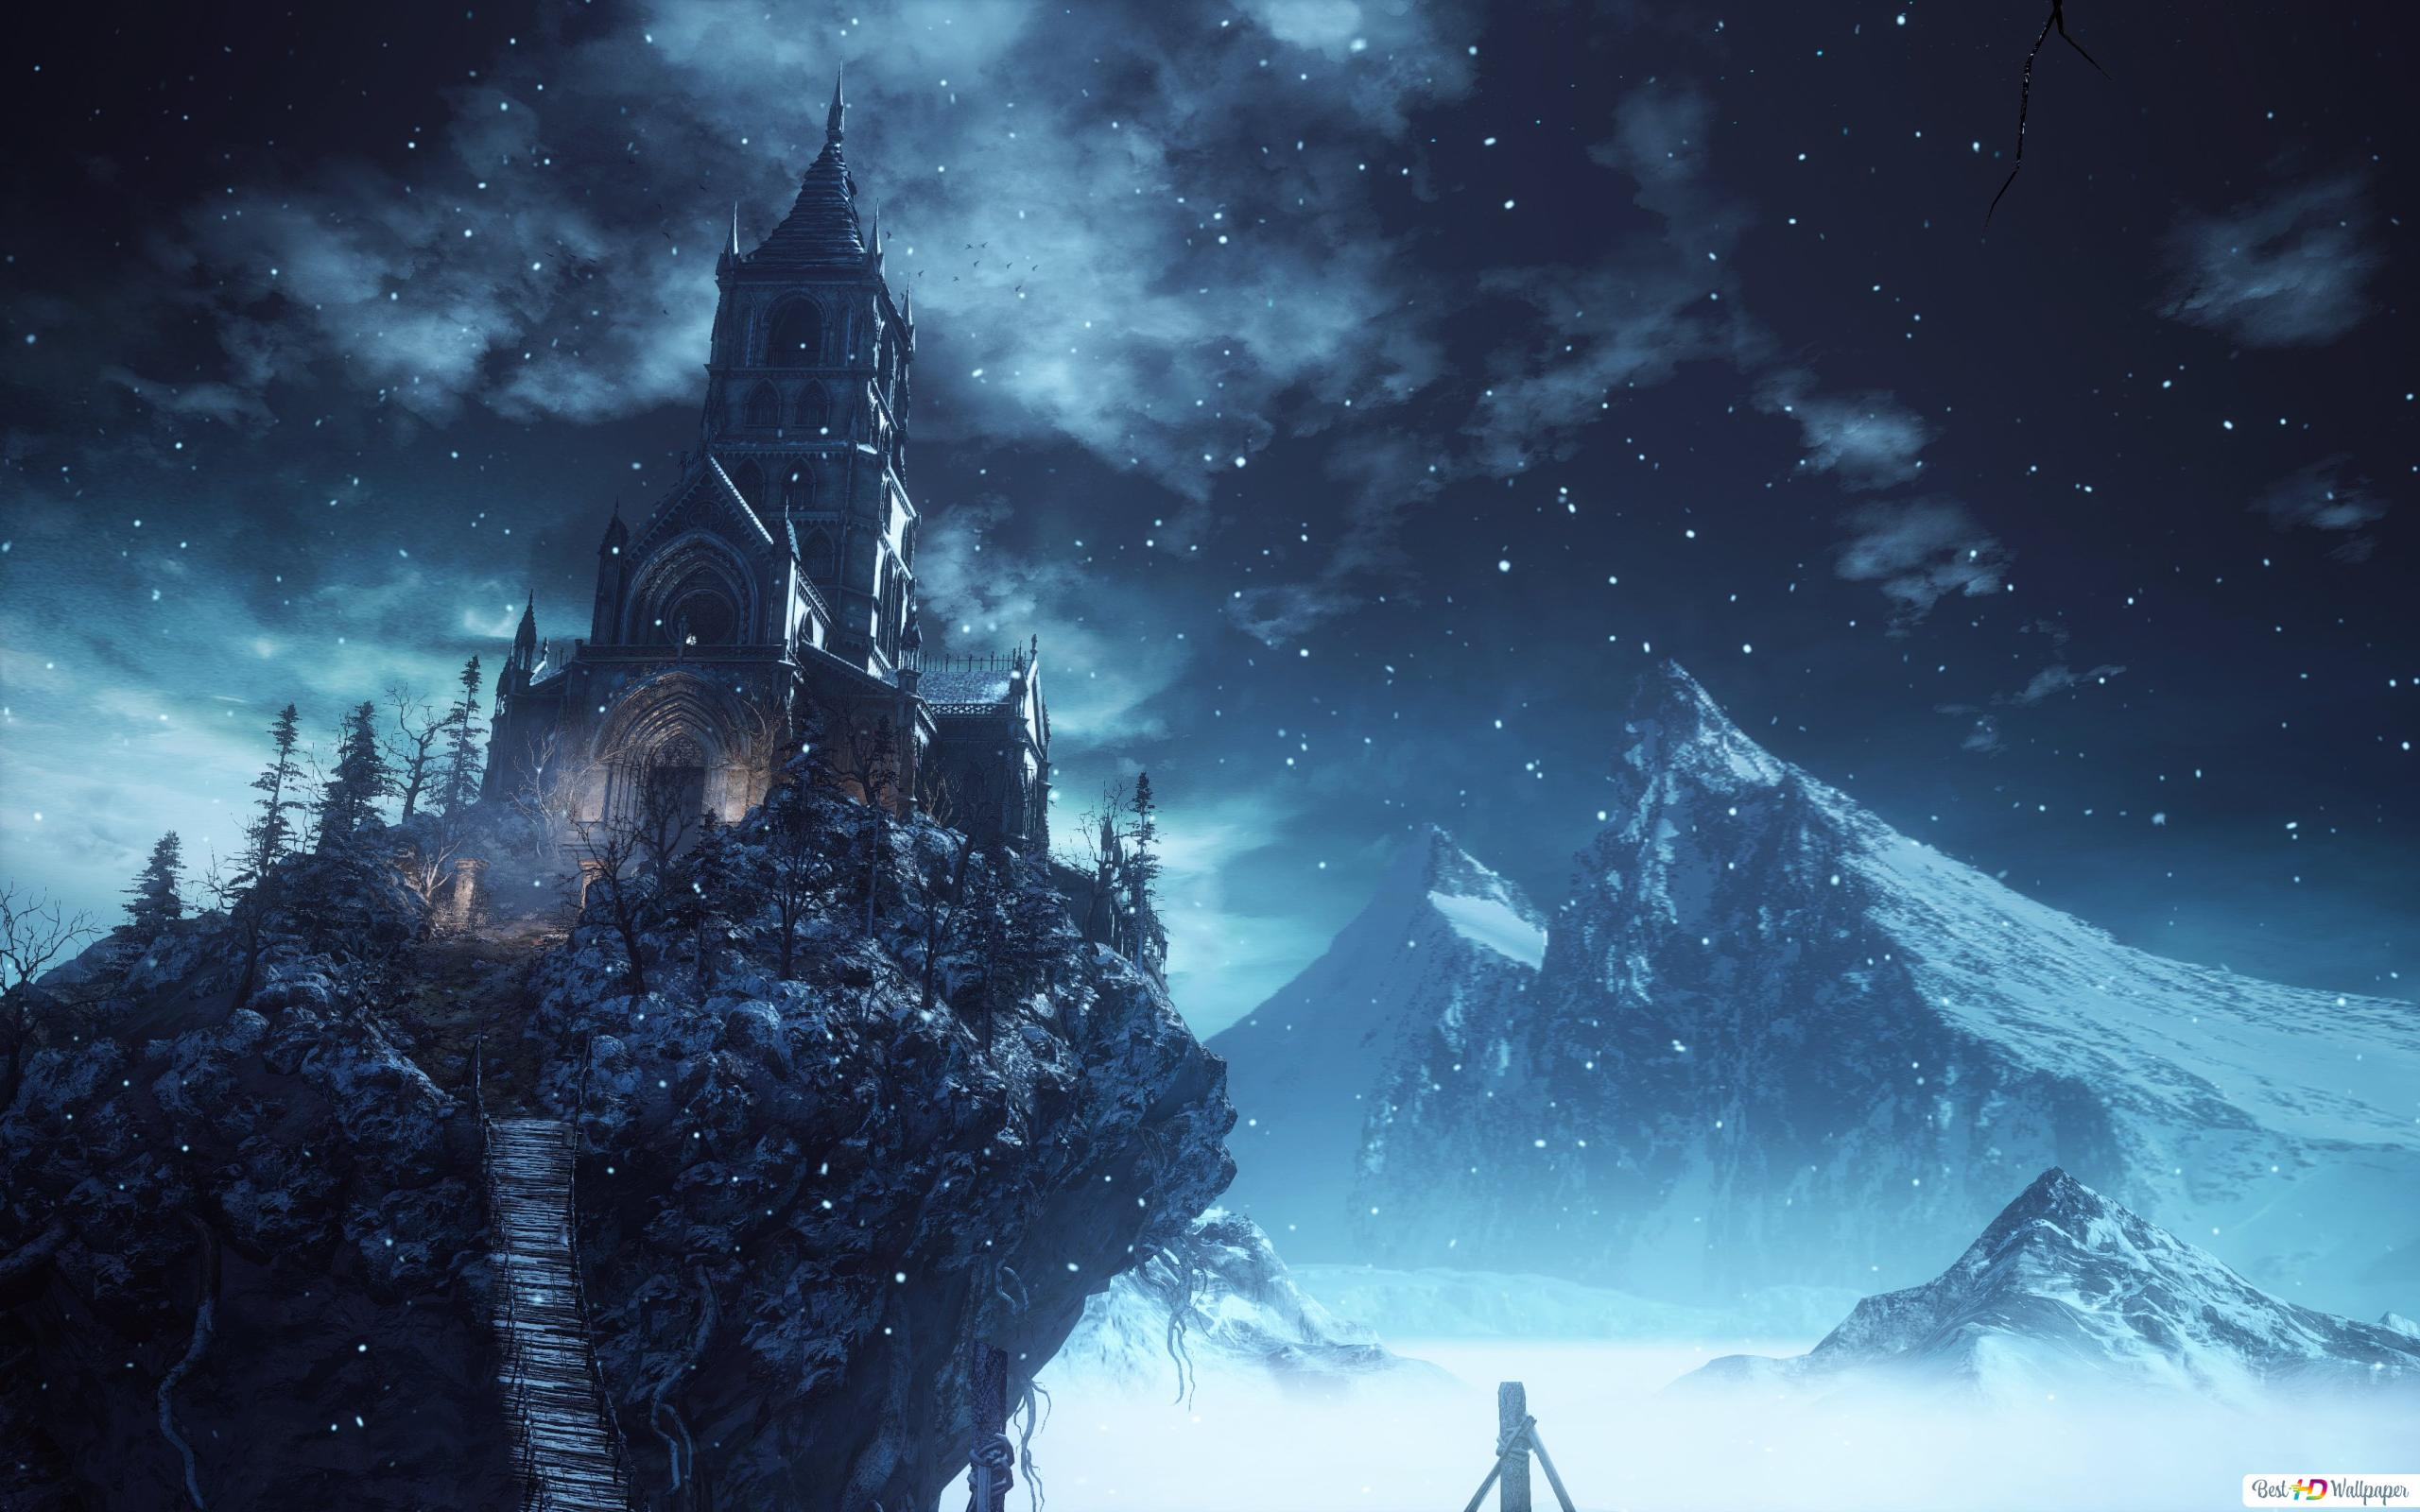 Dark Souls 3 Hd Wallpaper: Dark Souls III HD Wallpaper Download